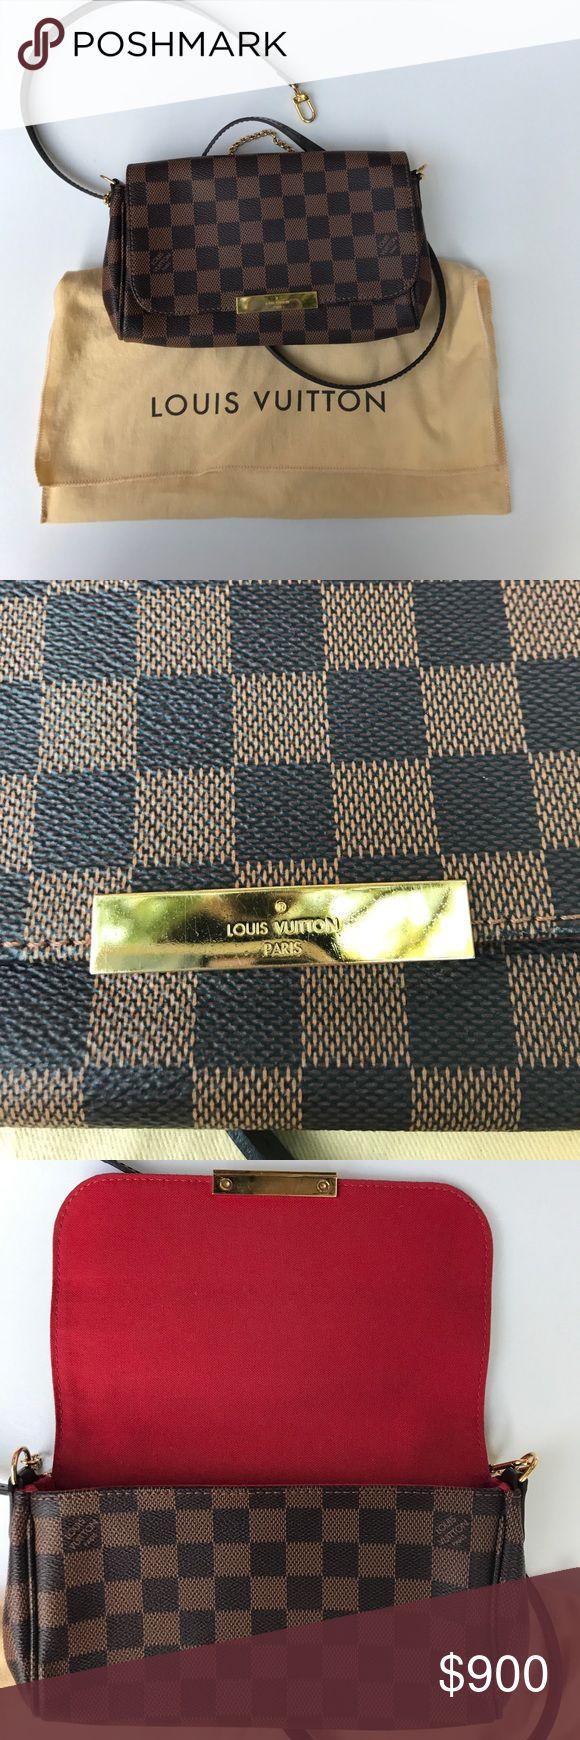 Authentic Louis Vuitton Bag Huh Louis Vuitton Bags Crossbody Bags